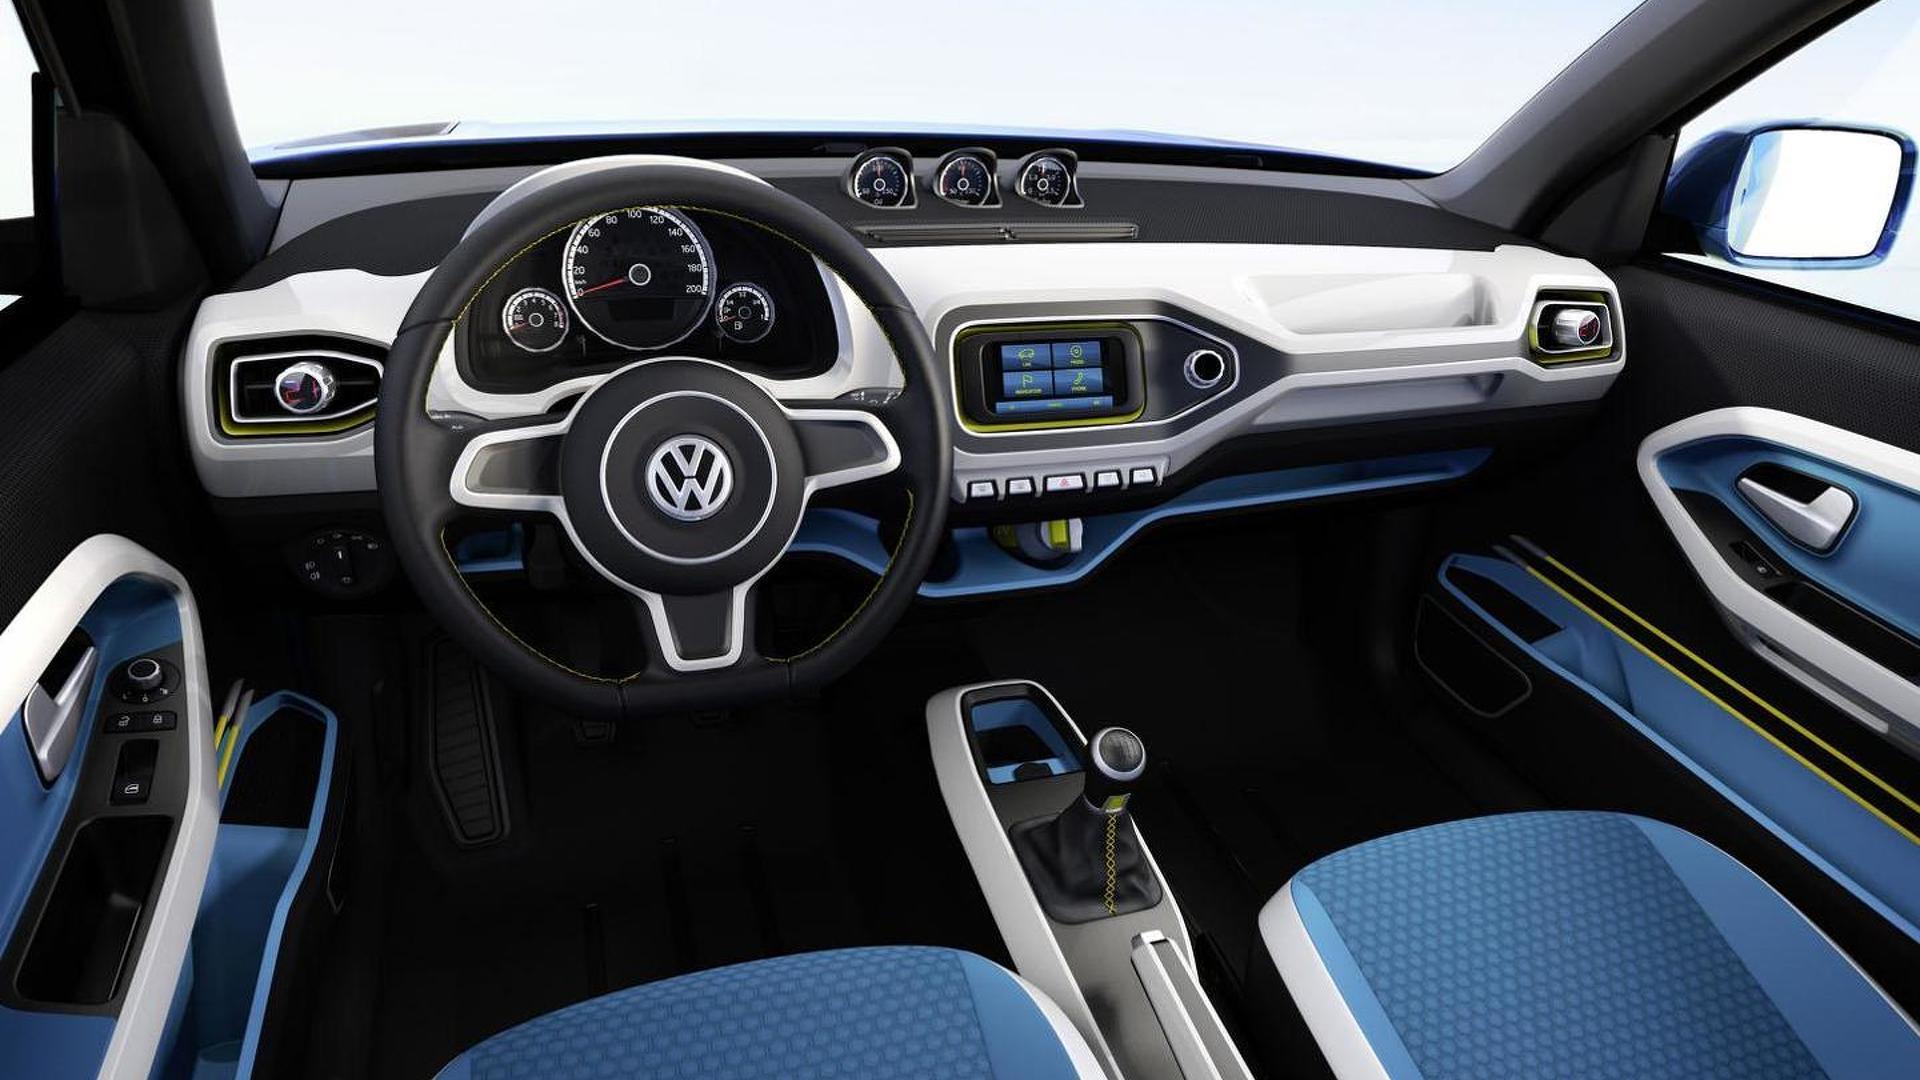 2012 339840 volkswagen taigun concept 22 10 20121